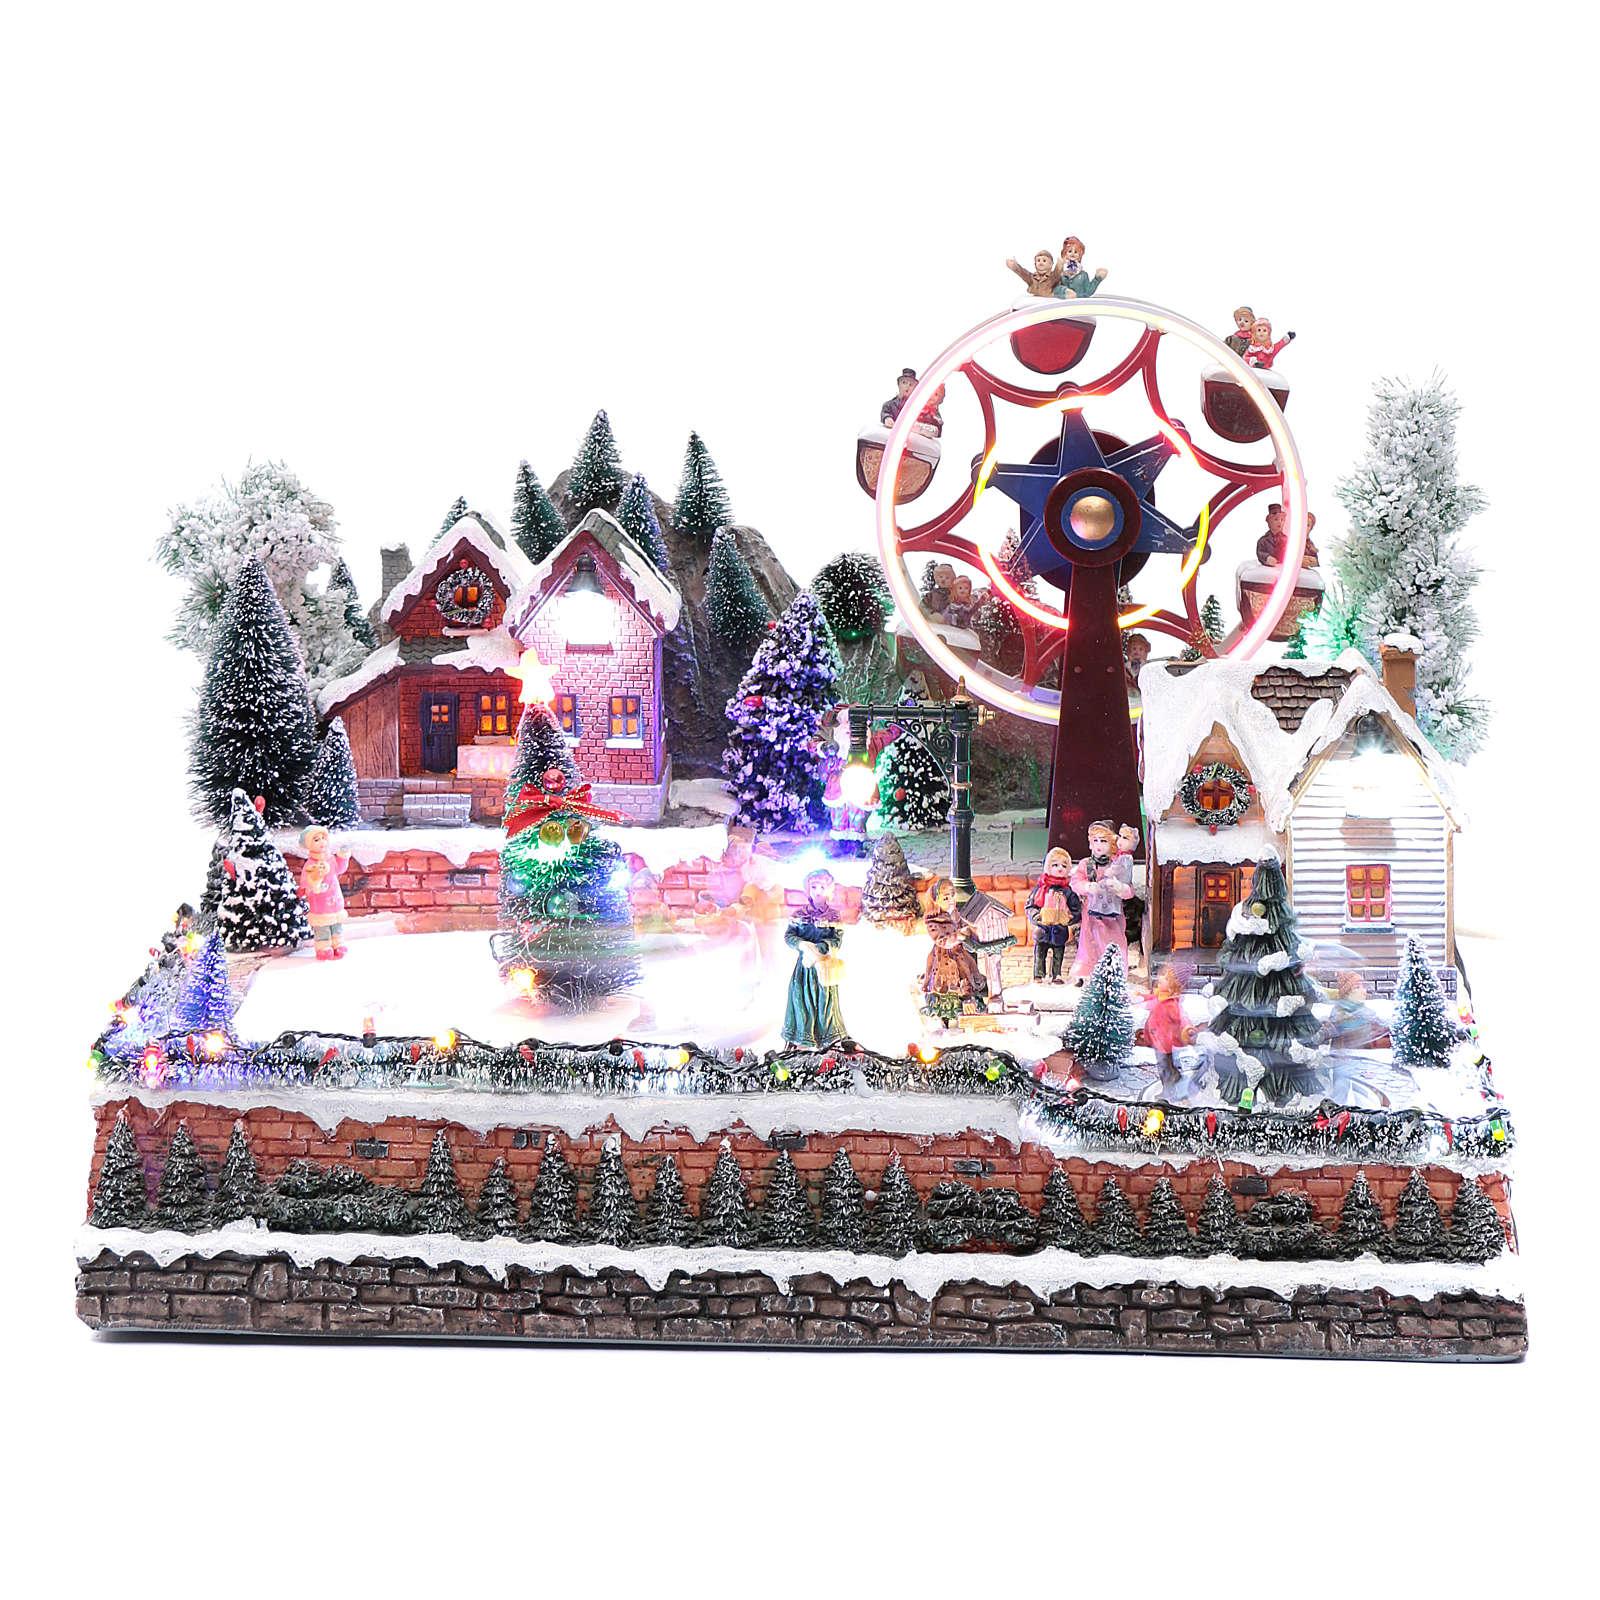 Ruota panoramica invernale con albero rotante 30x40x35 cm 3